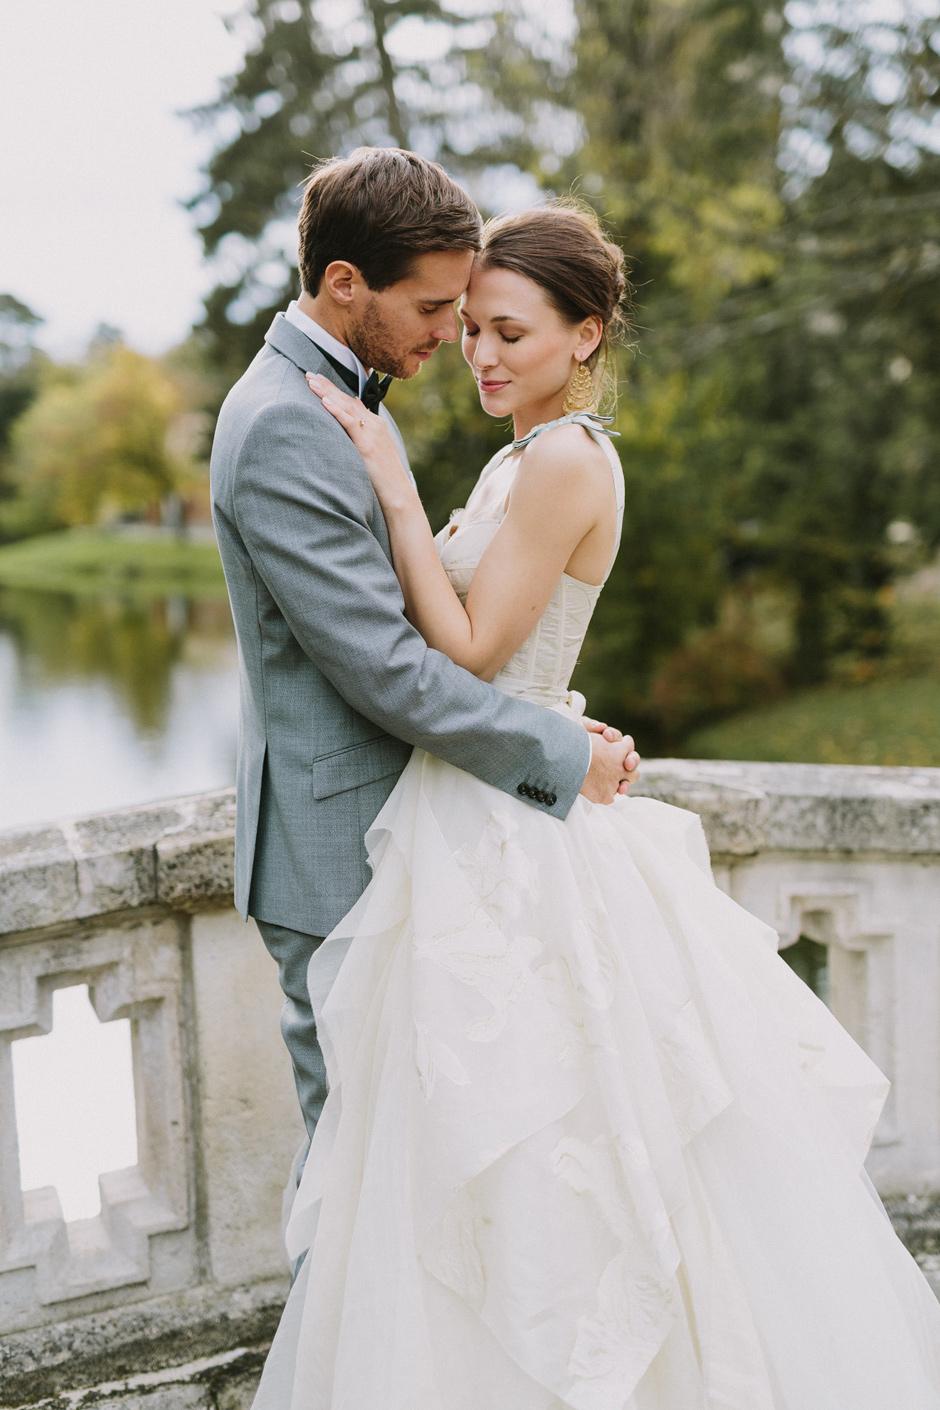 laxenburg-wedding-photographer-042